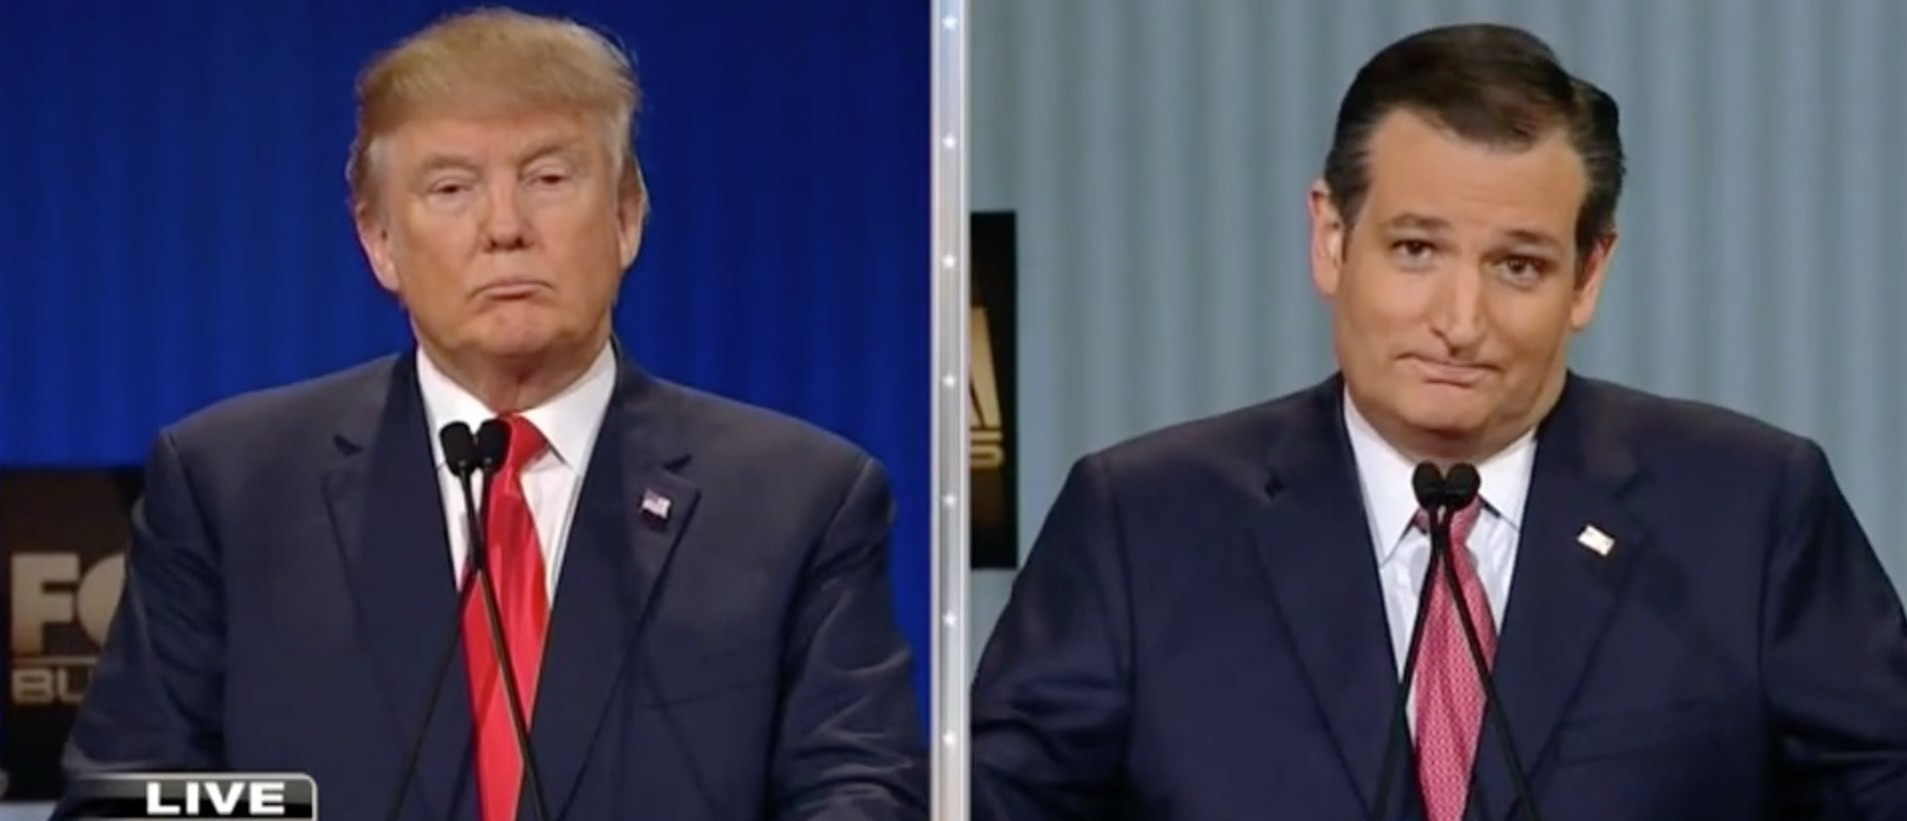 Donald Trump Shuts Down Ted Cruz's Criticism Of His 'New York Values' [screen shot FBN]